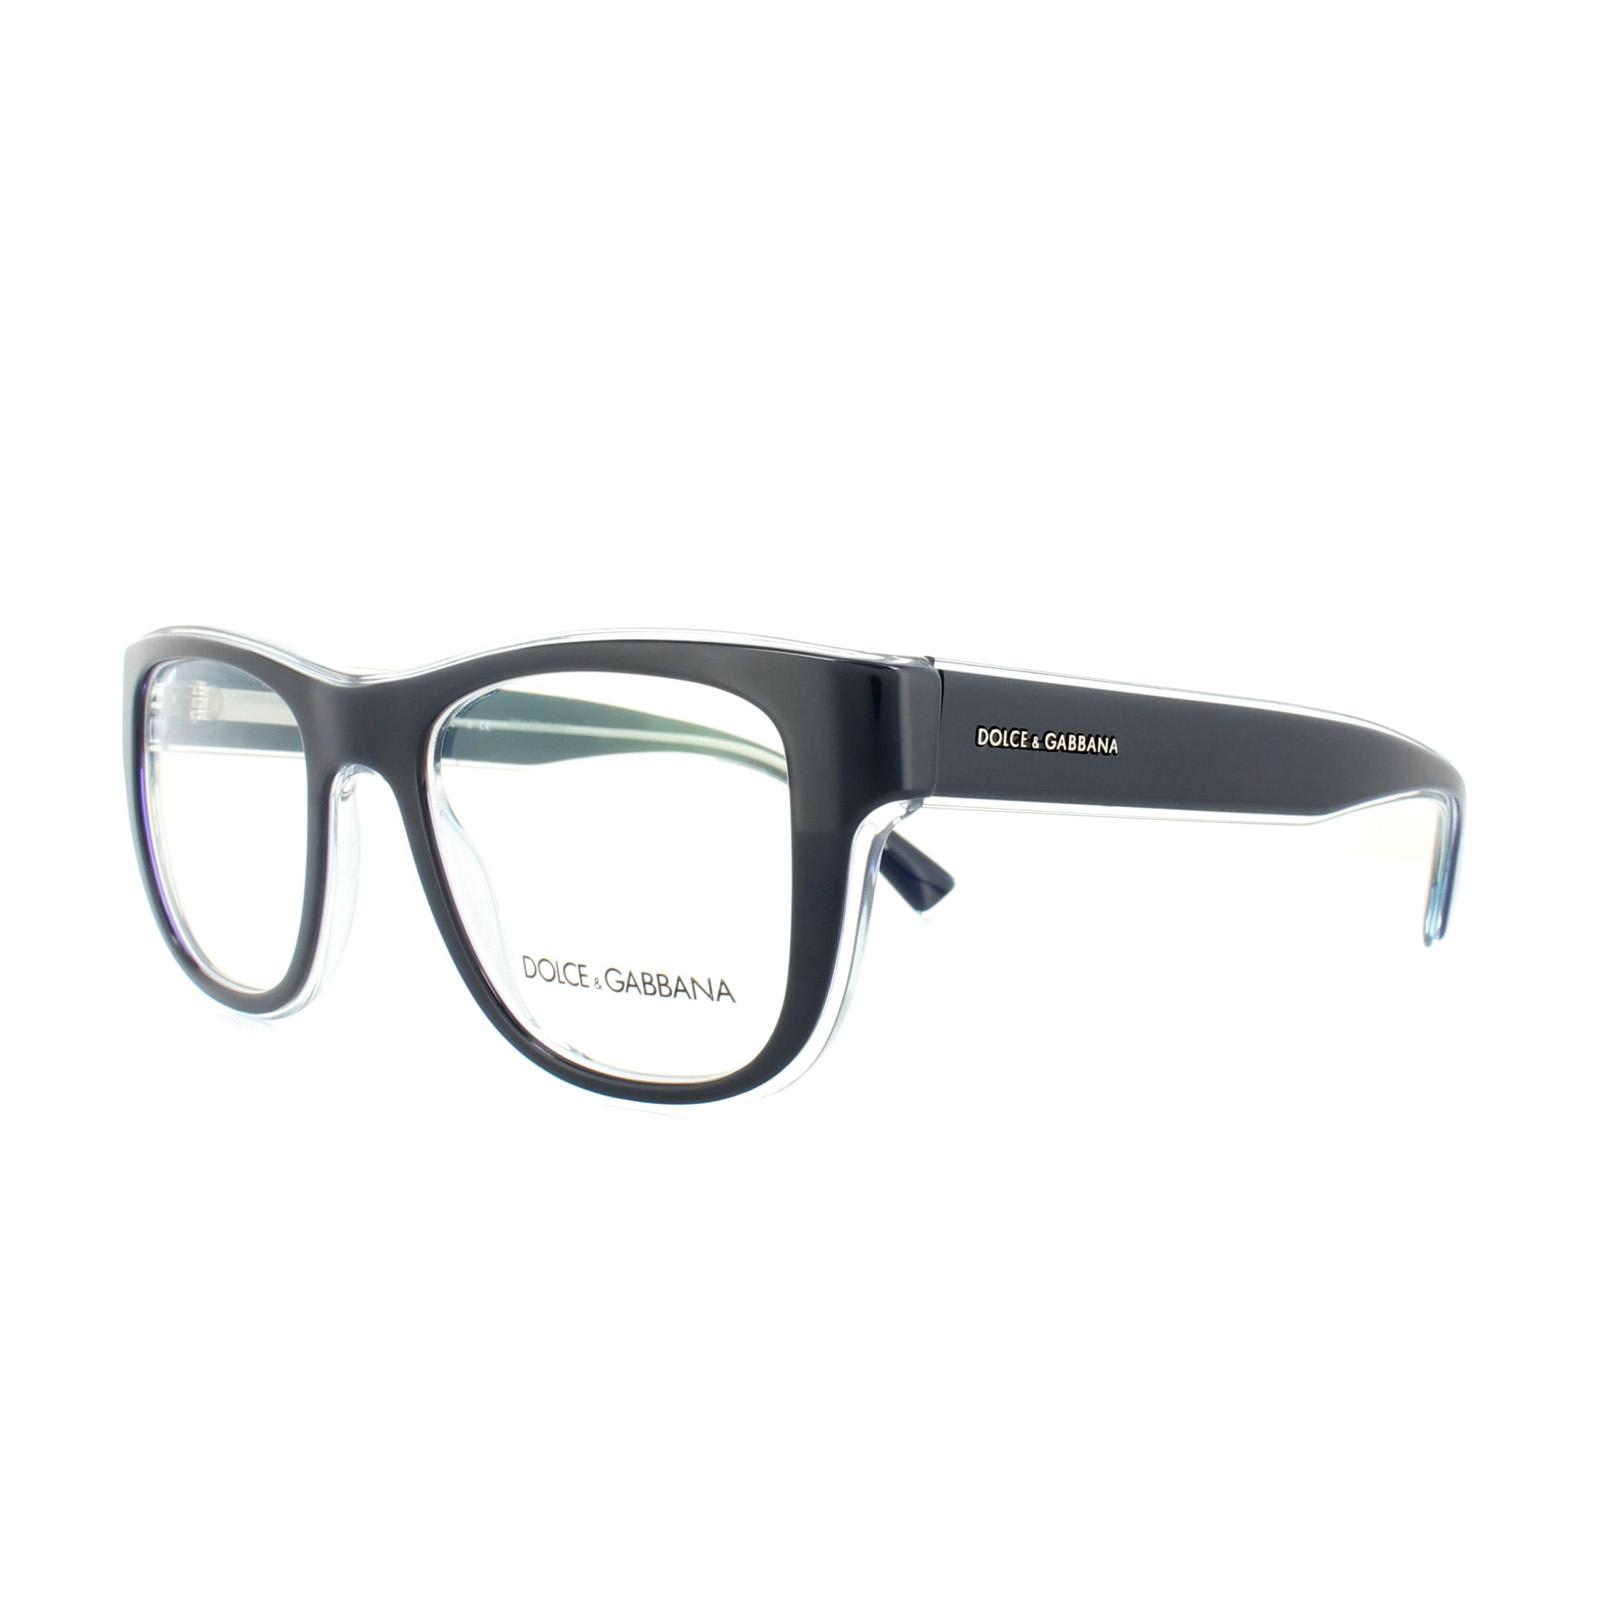 f315c33f11bb Sentinel Dolce and Gabbana Glasses Frames DG3252 3048 Blue On Transparent  Azure Mens 51mm